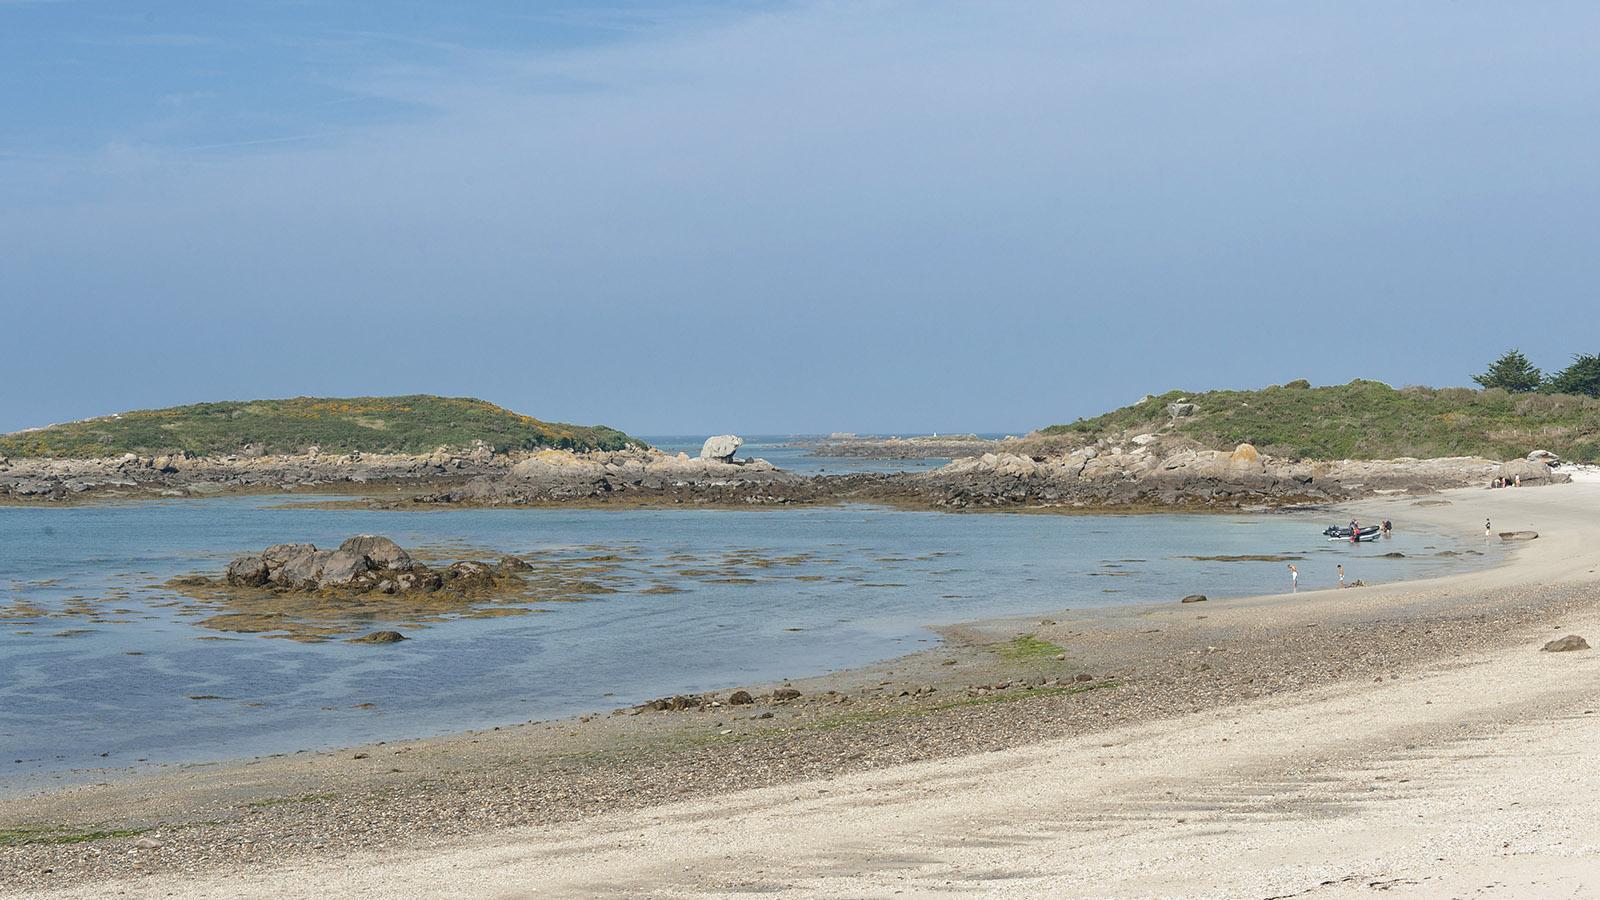 Îles Chausey, Grande Île. Foto: Hilke Maunder